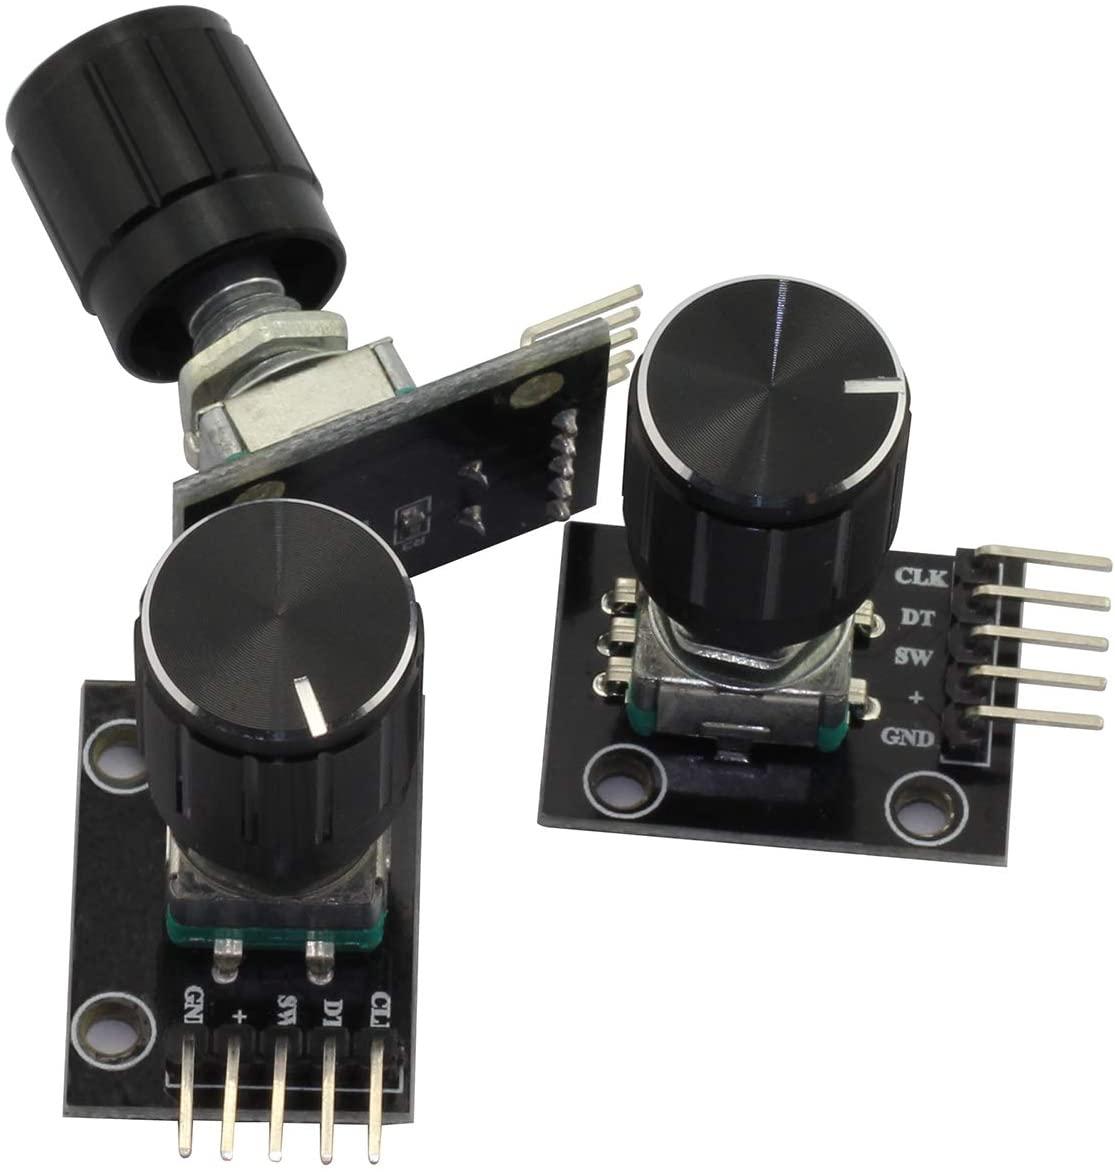 Magic&shell 3 PCS KY-040 Rotary Encoder Module Brick Sensor Development with Knob Cap for Arduino